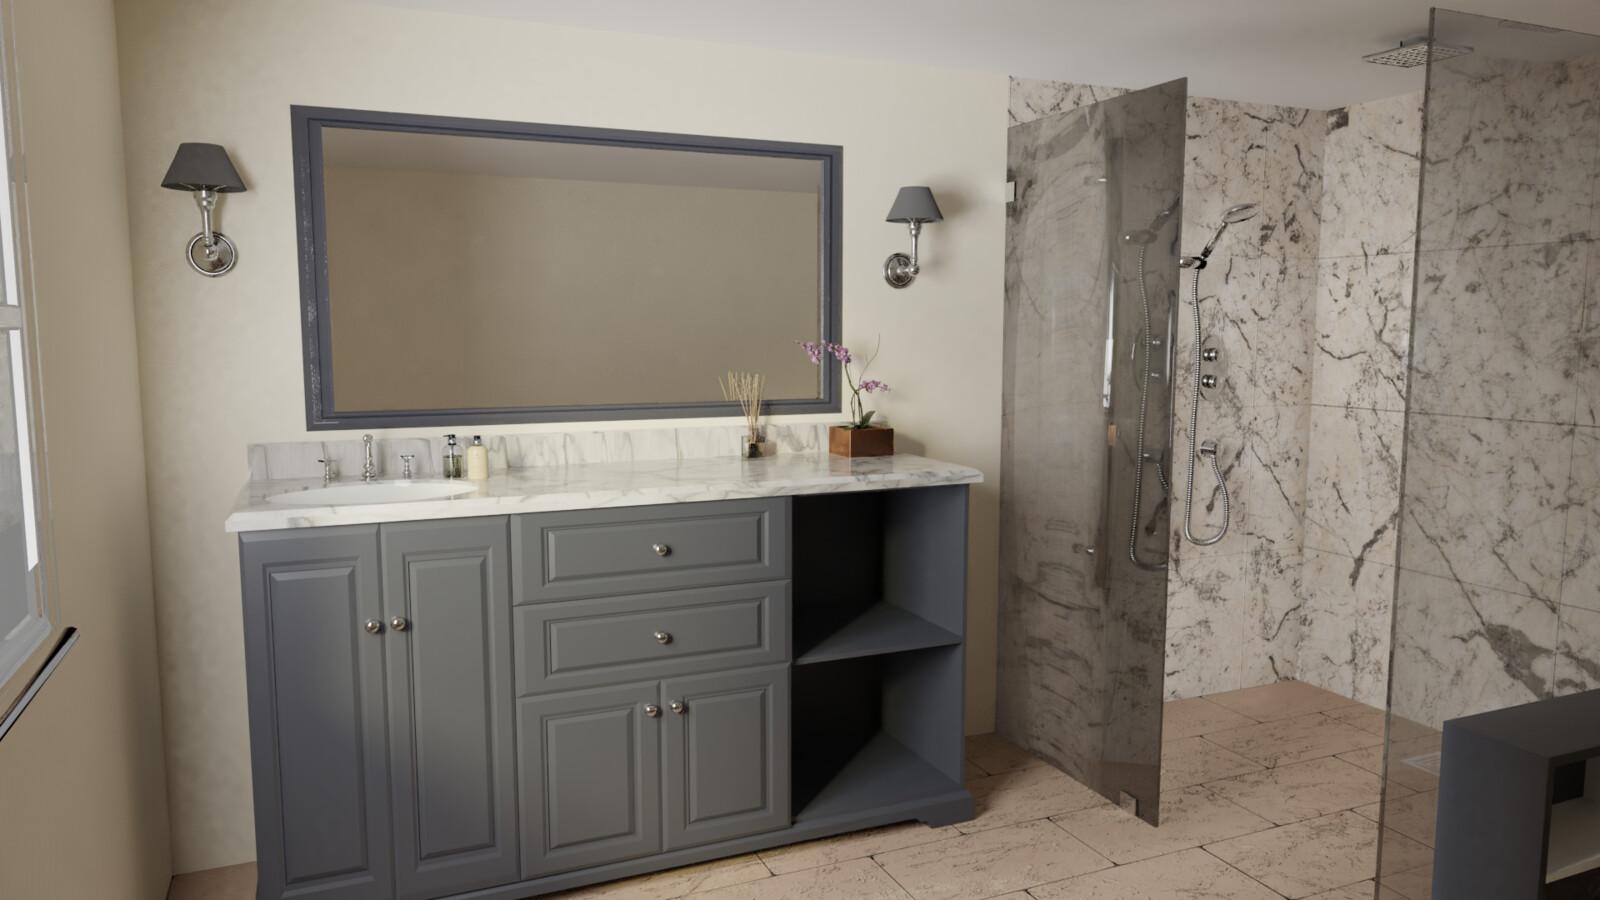 Bathroom (Architectural Render)